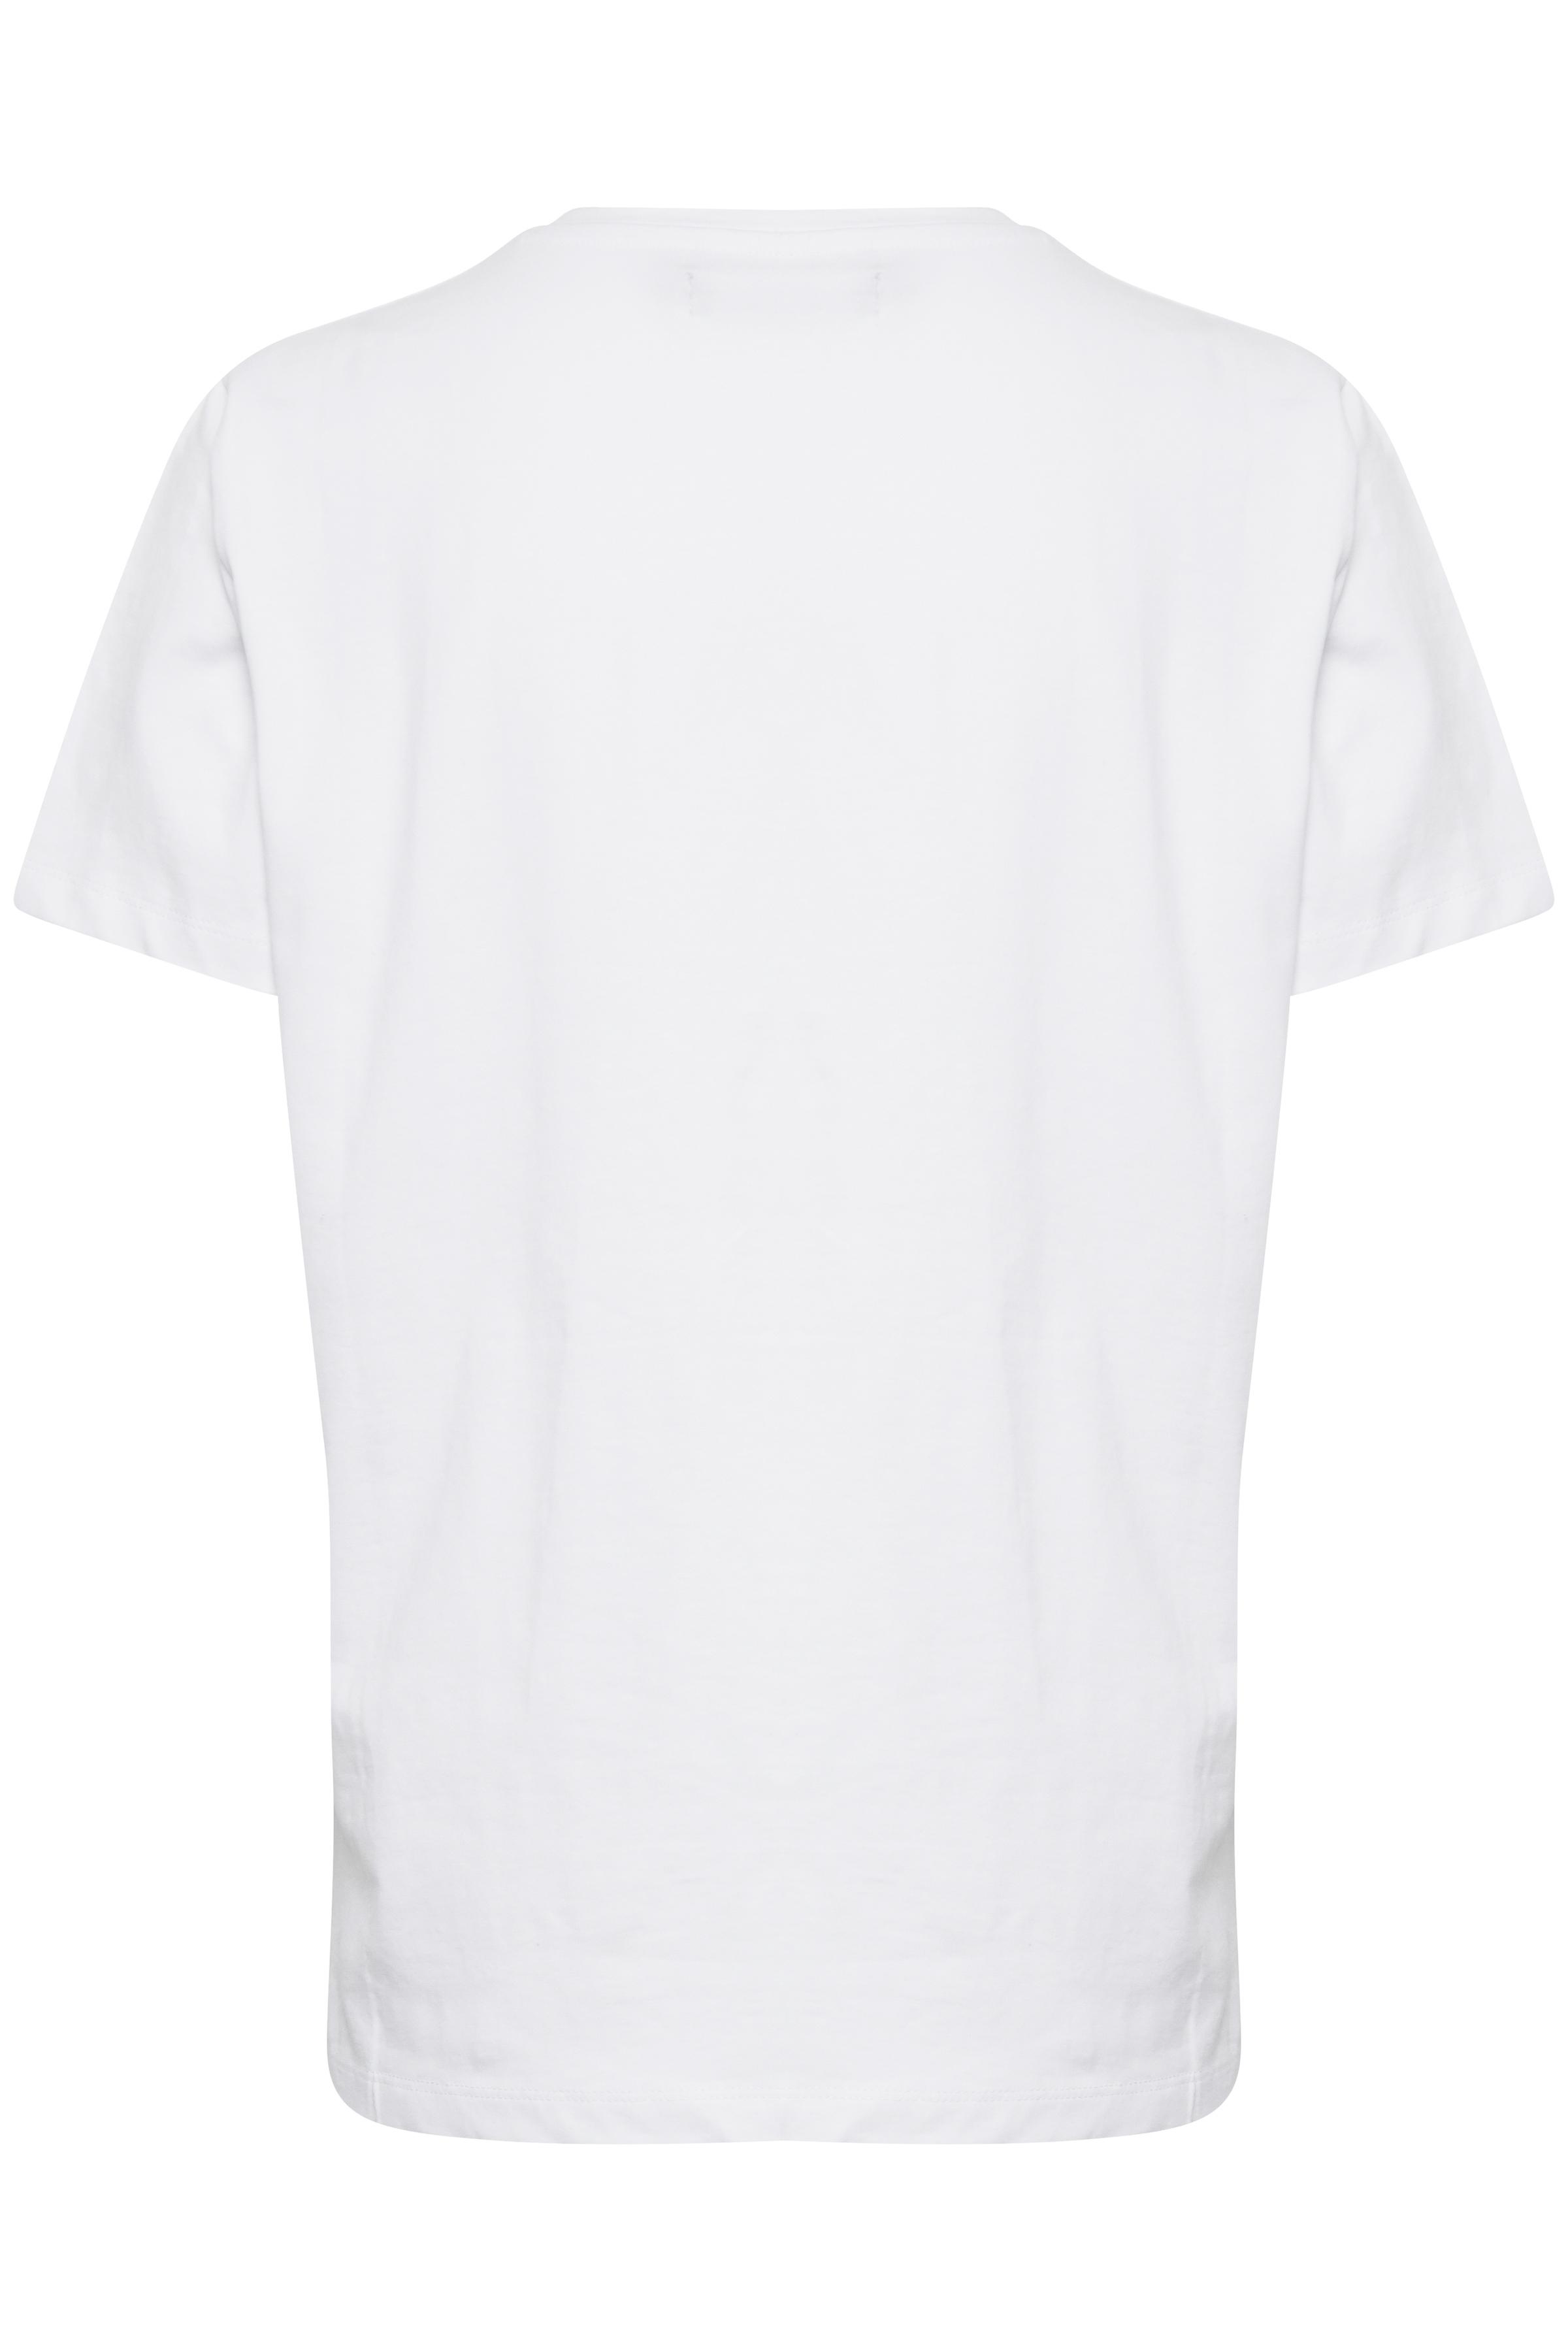 Optical White T-shirt fra b.young – Køb Optical White T-shirt fra str. XS-XXL her